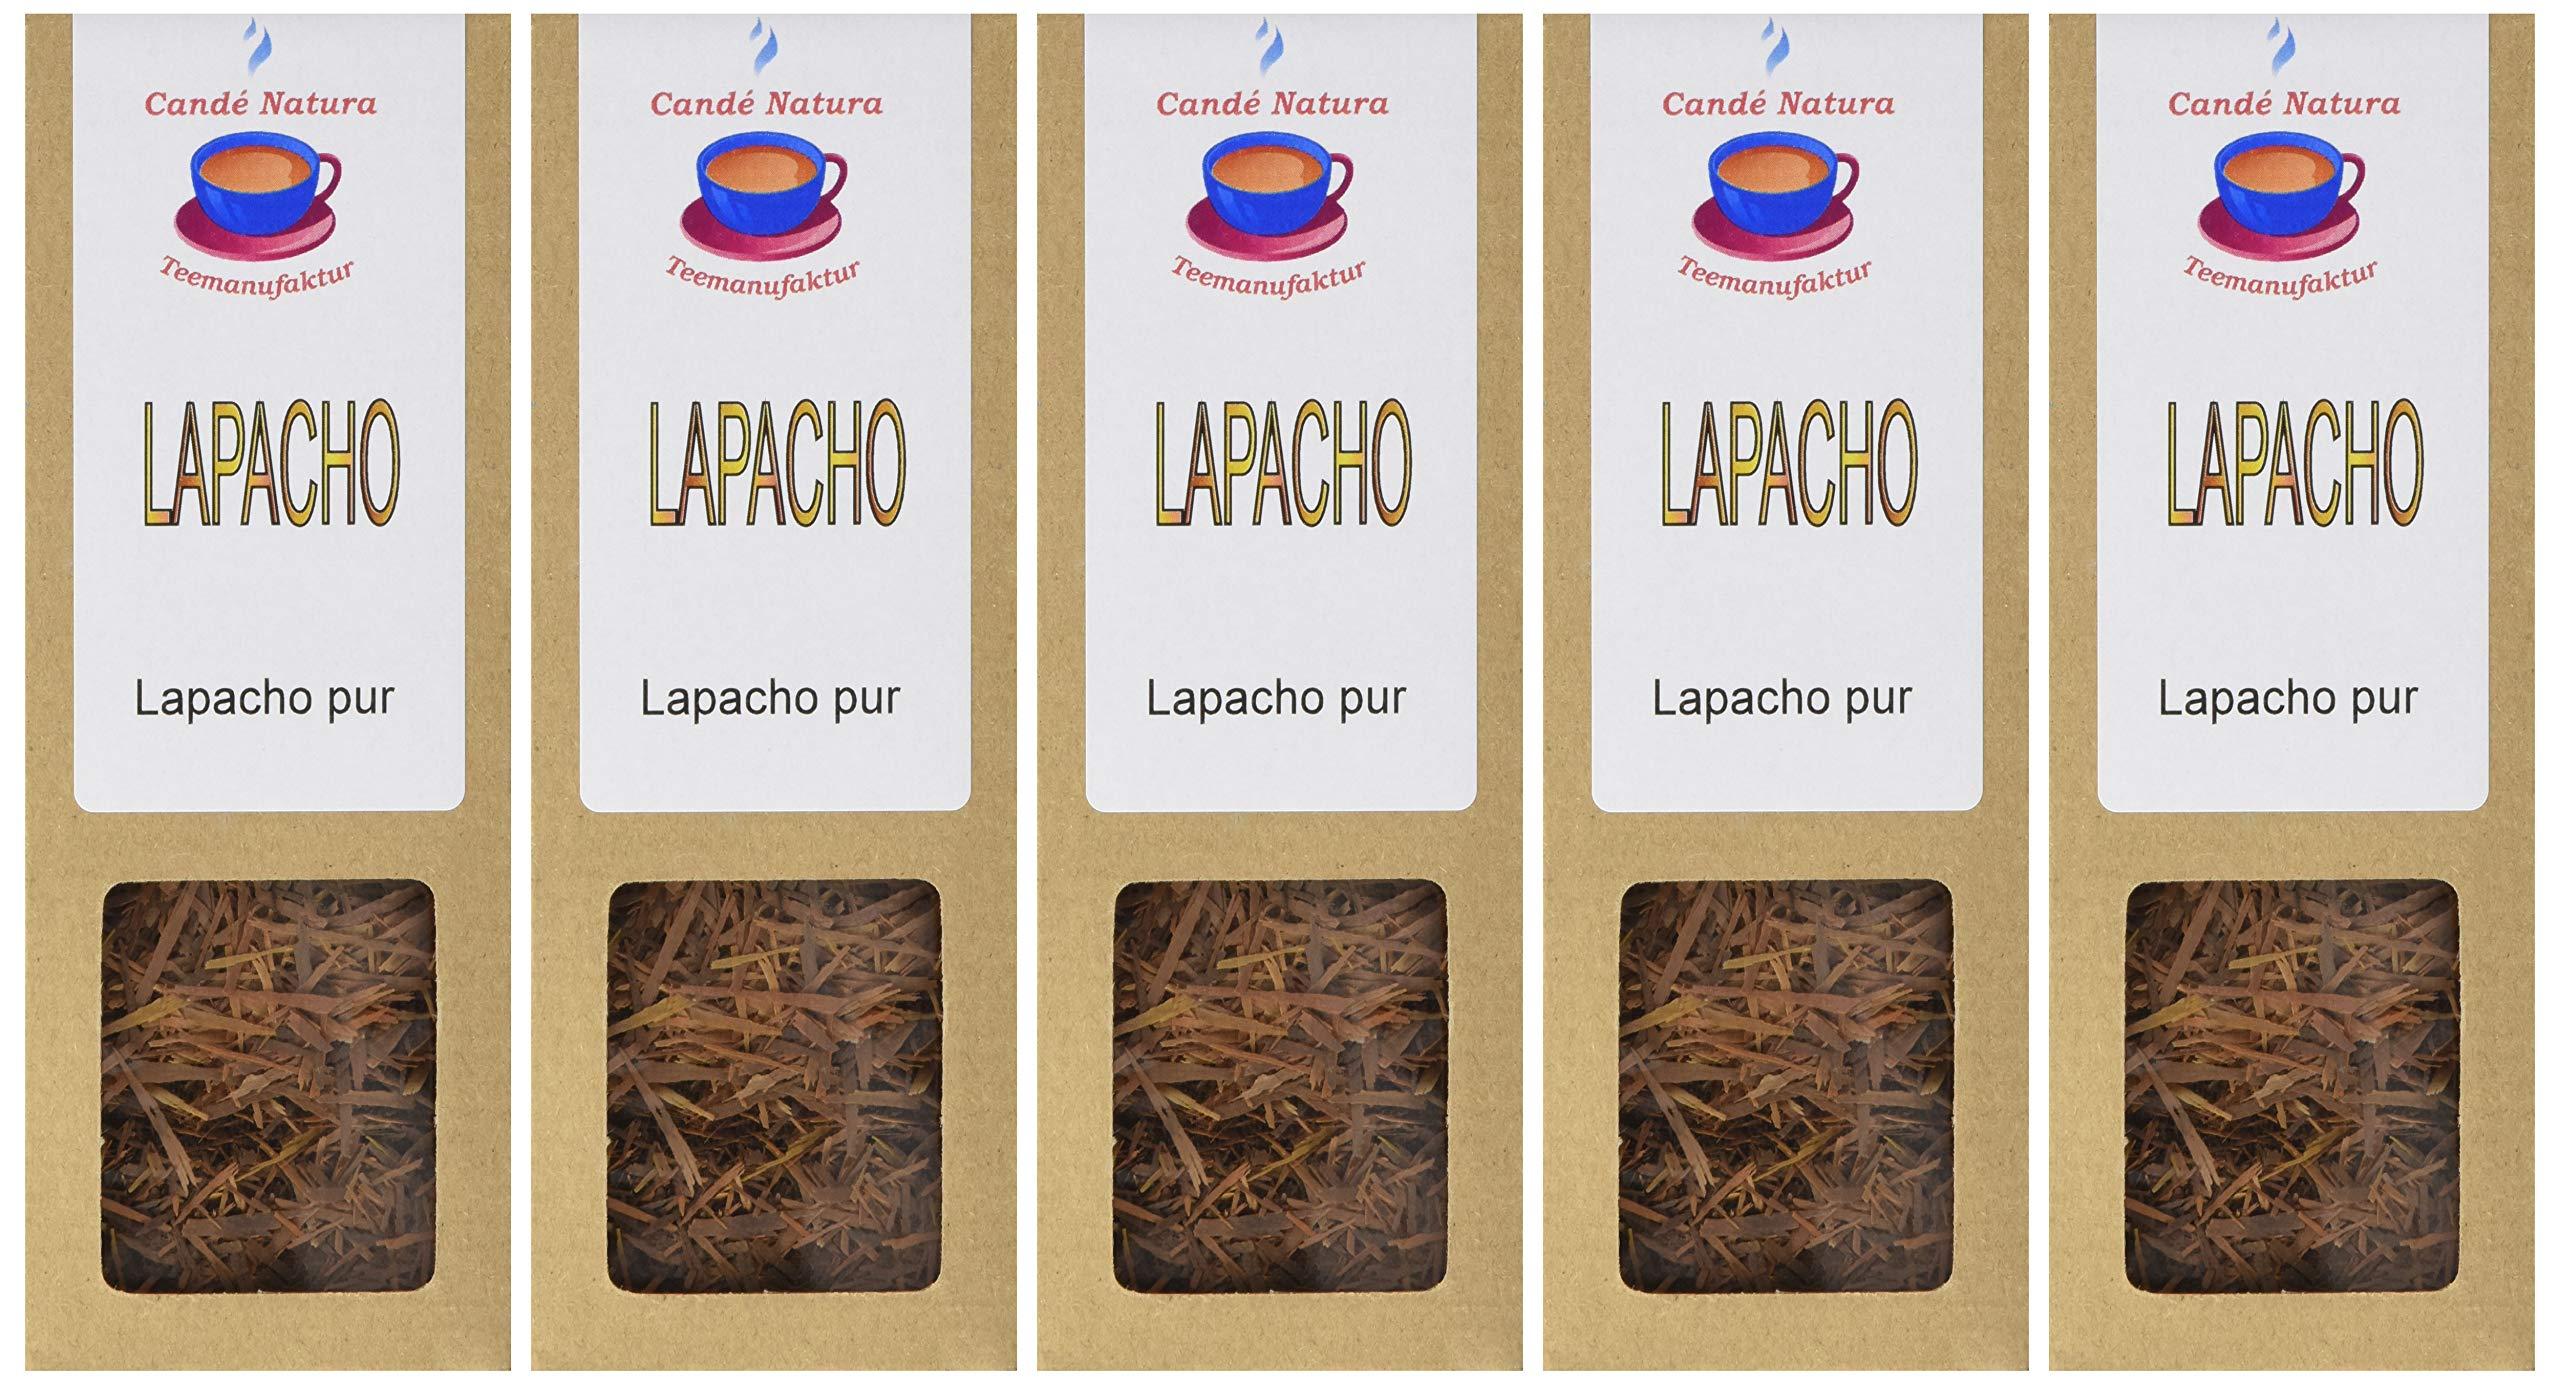 Cand-Natura-Teemanufaktur-Lapacho-Rindentee-pur-5er-Pack-5-x-60-g